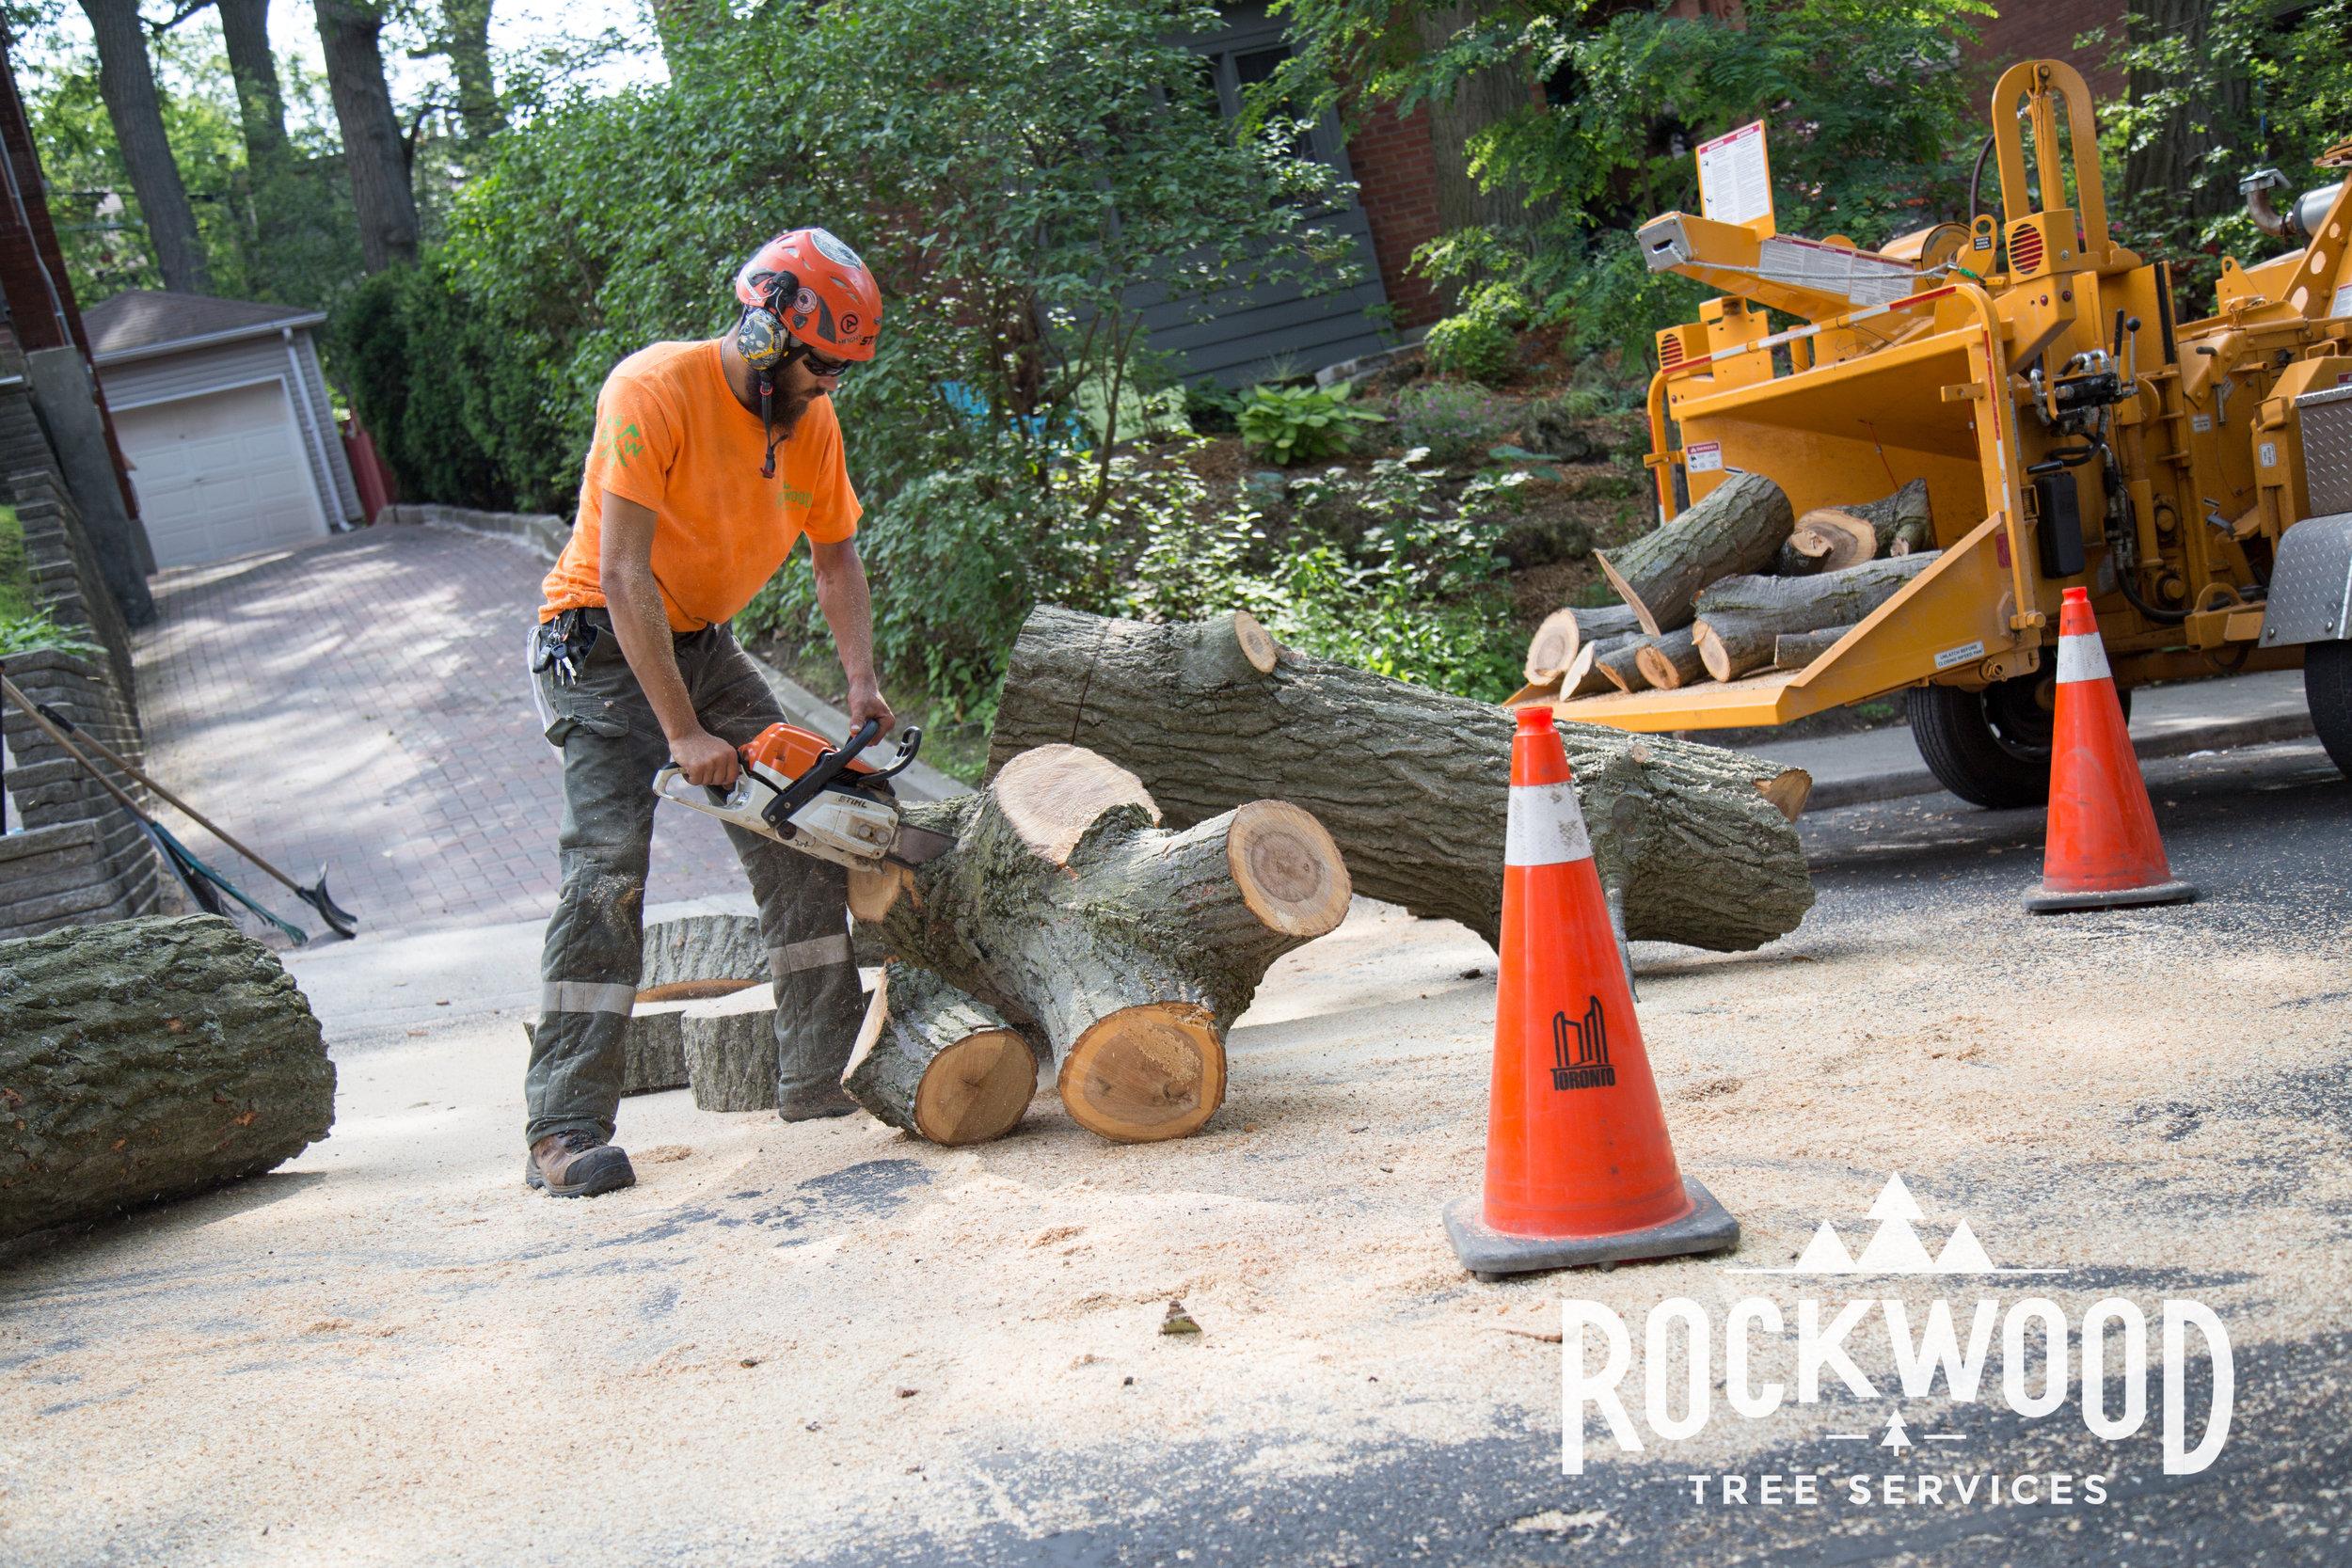 Rockwood Tree Services (17 of 351).jpg